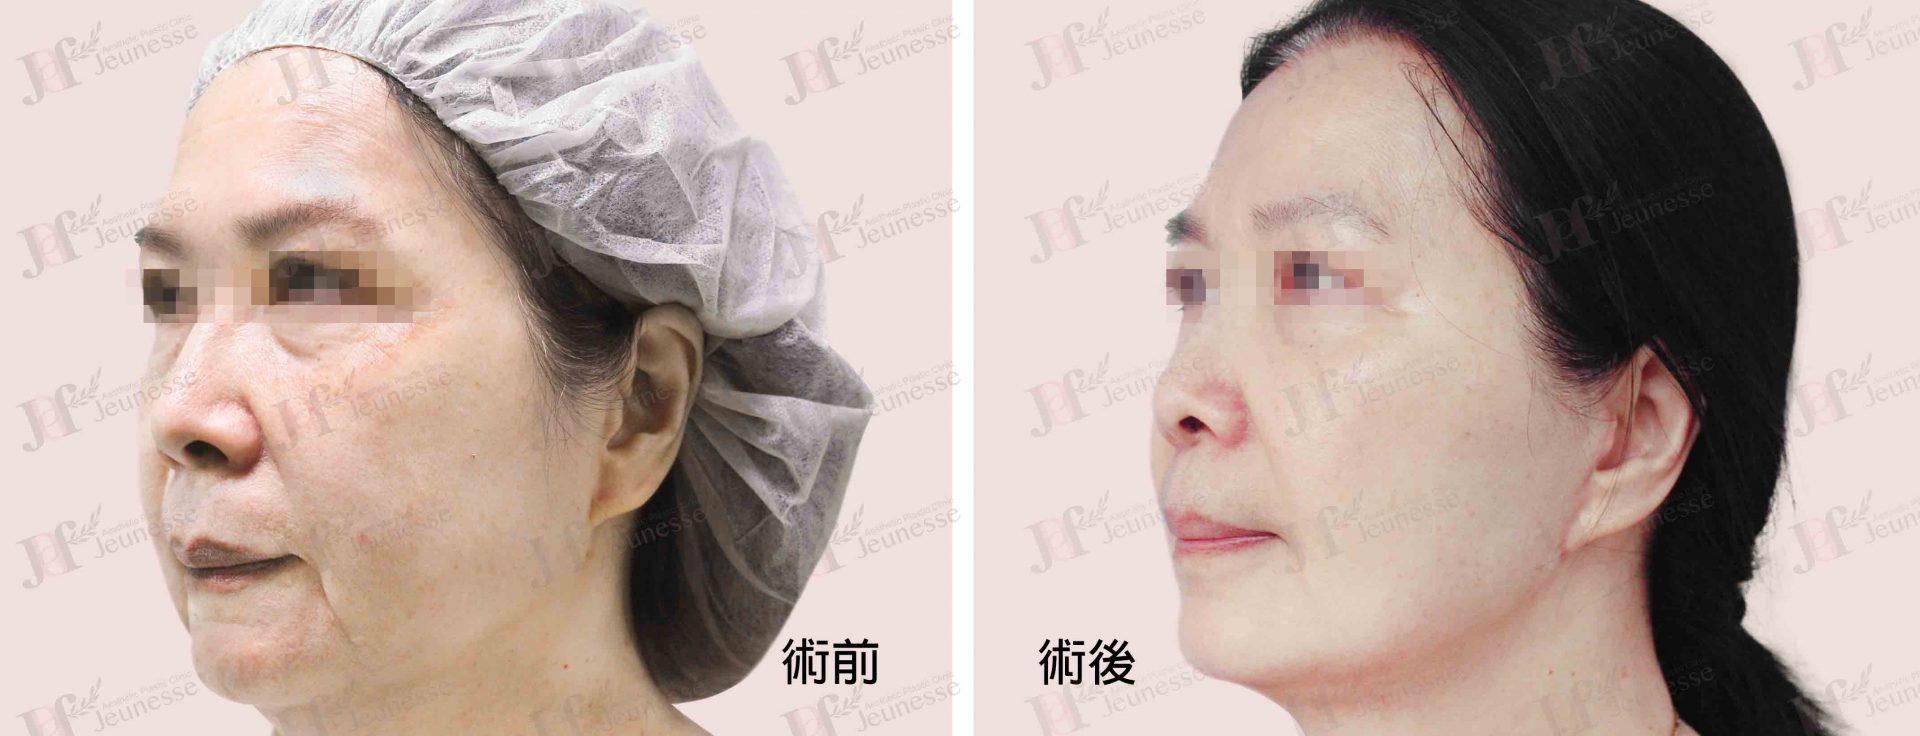 Midface lifting case 1 45度 -浮水印